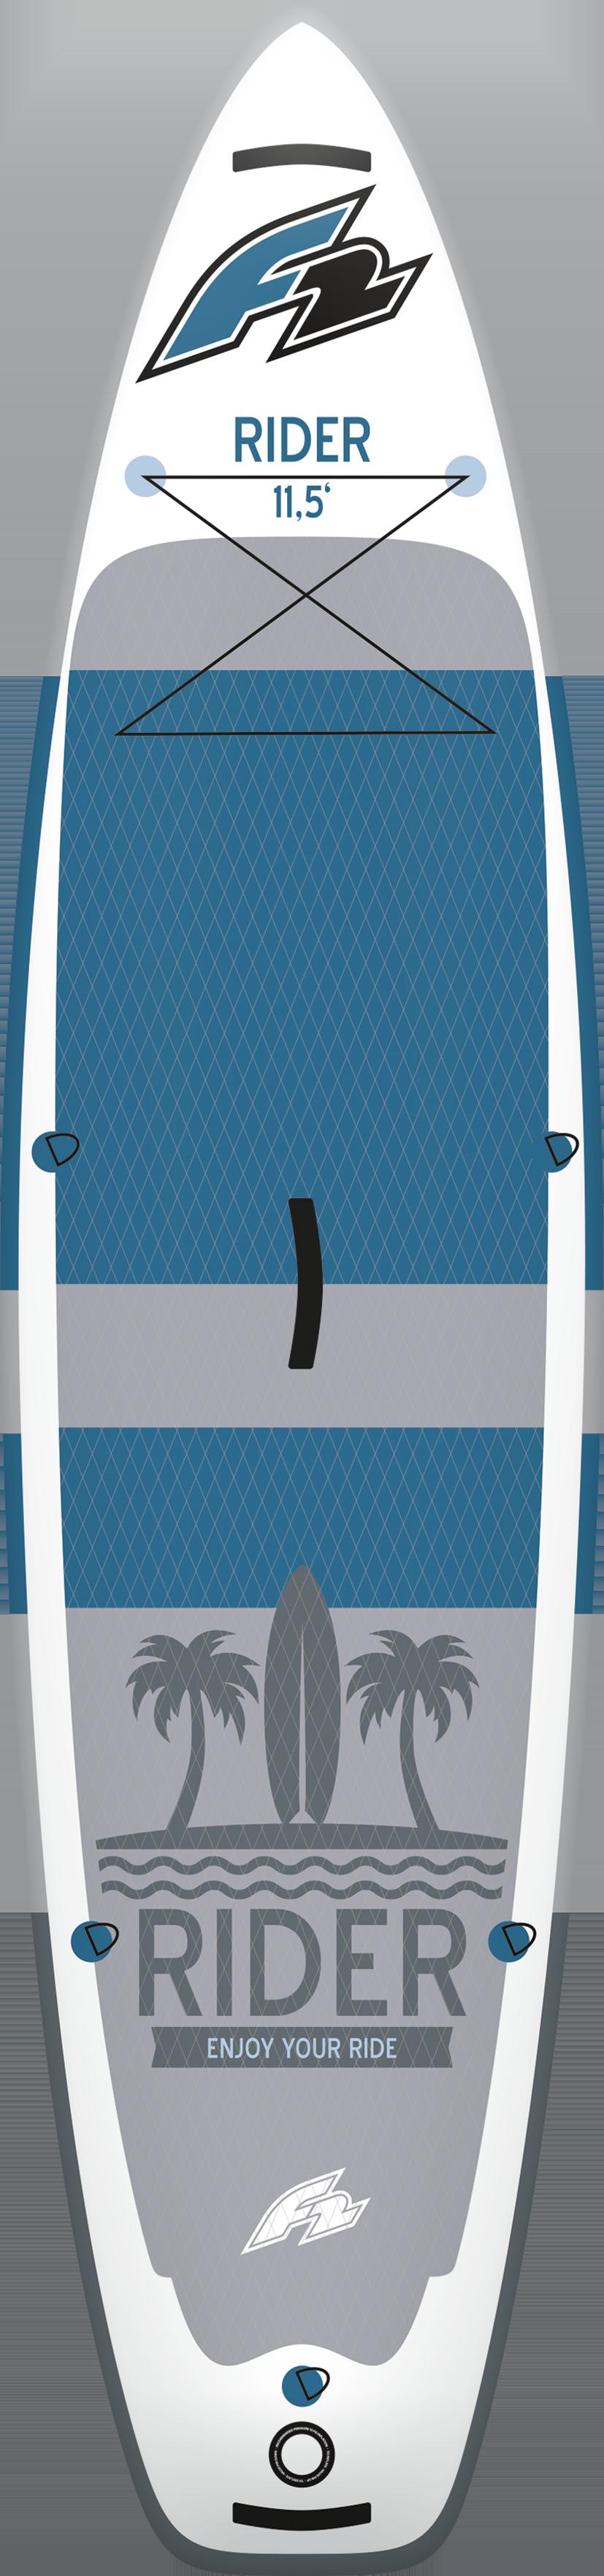 RIDER - Top